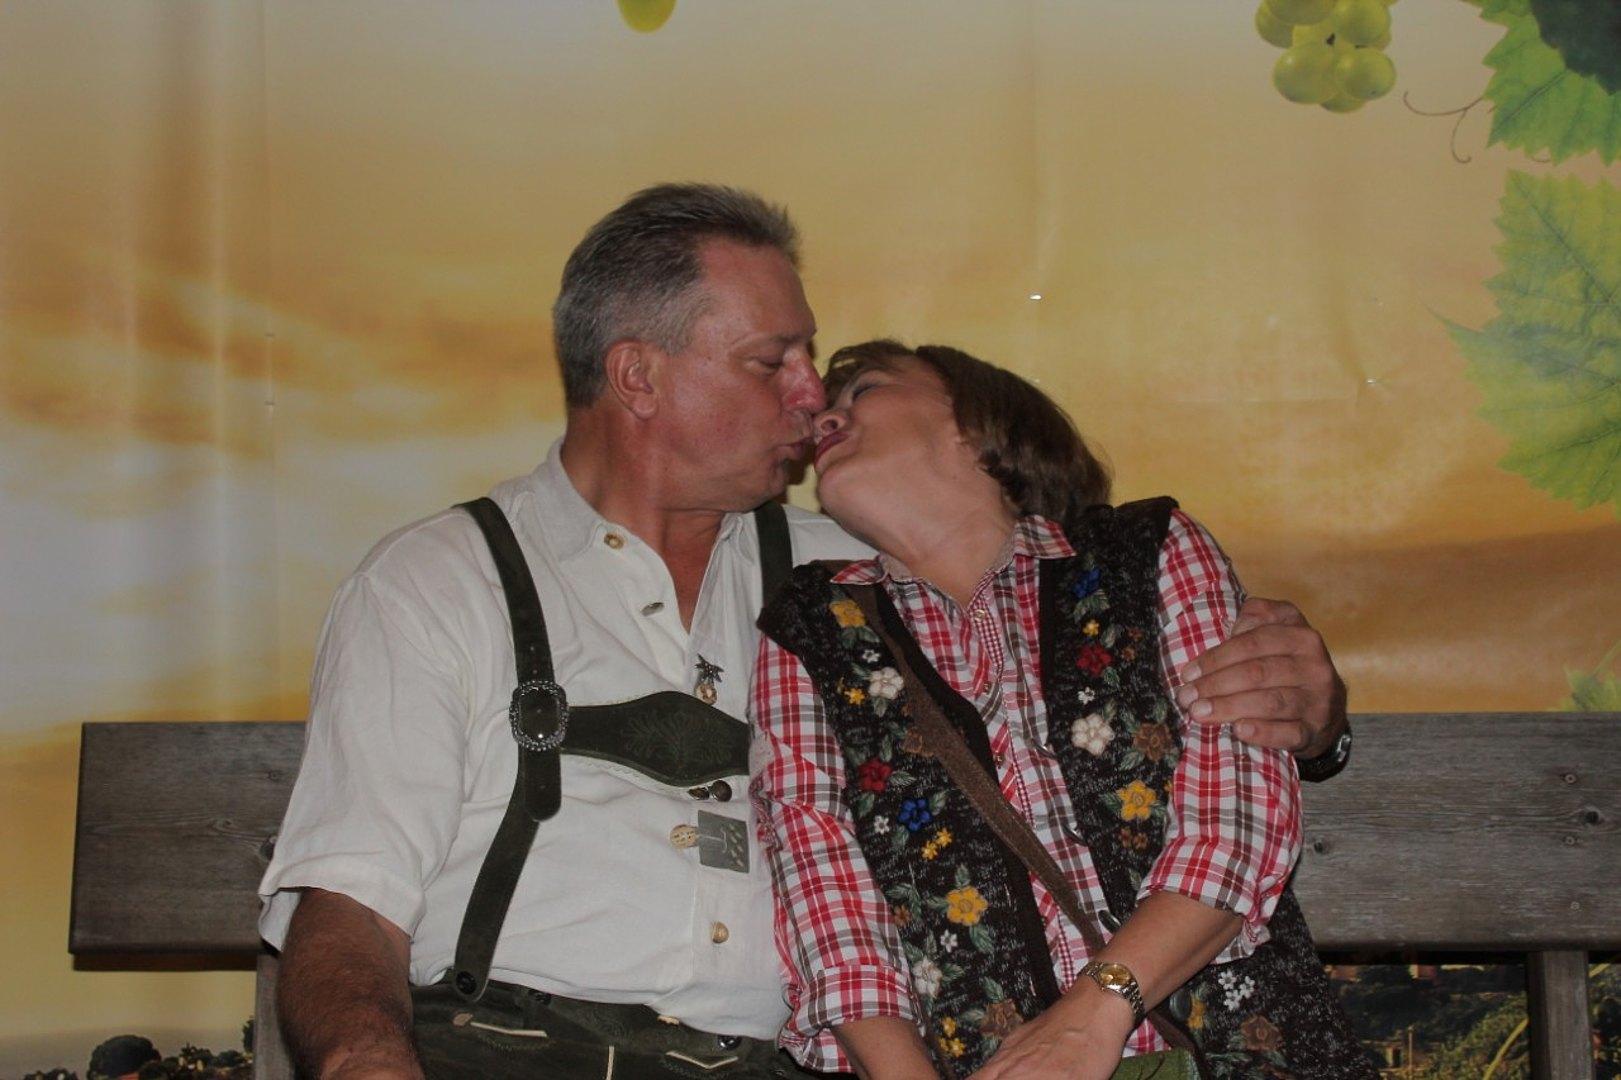 Blitz dating aus tulbing Online partnersuche gllersdorf